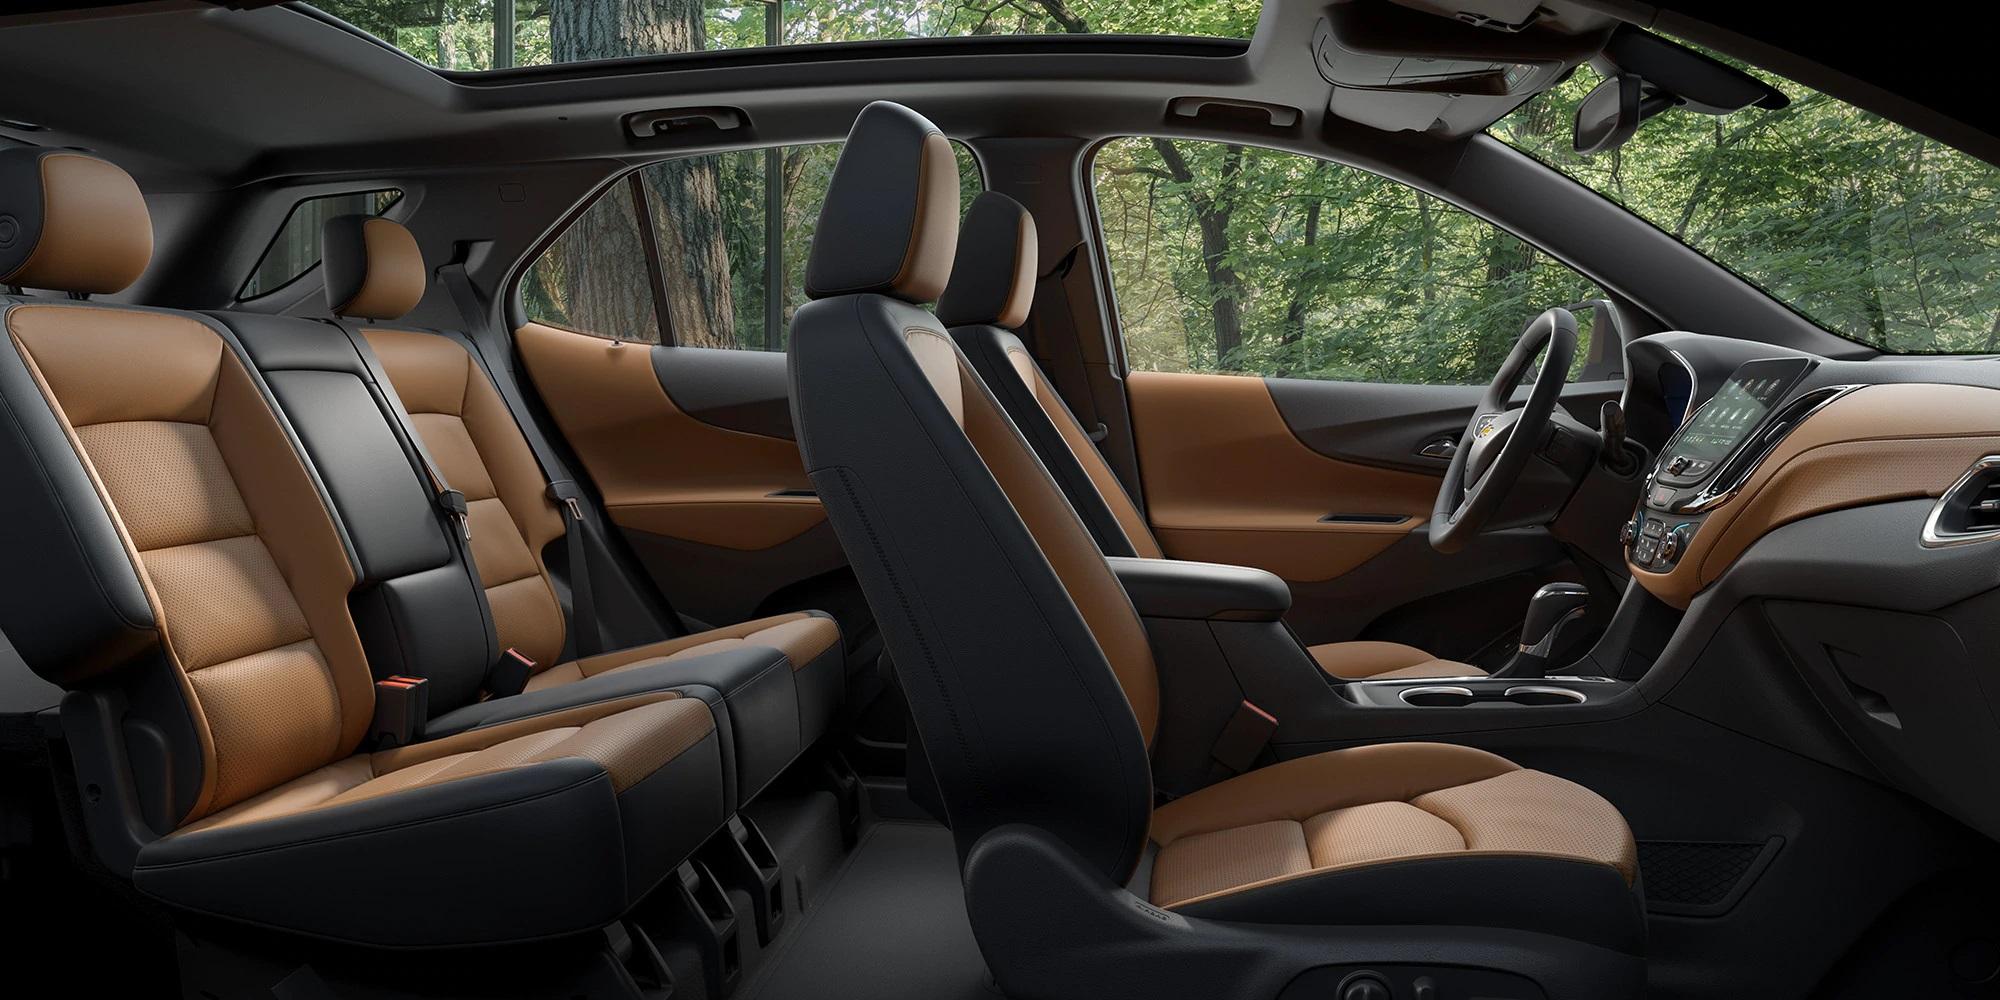 2020 Chevrolet Equinox Seating